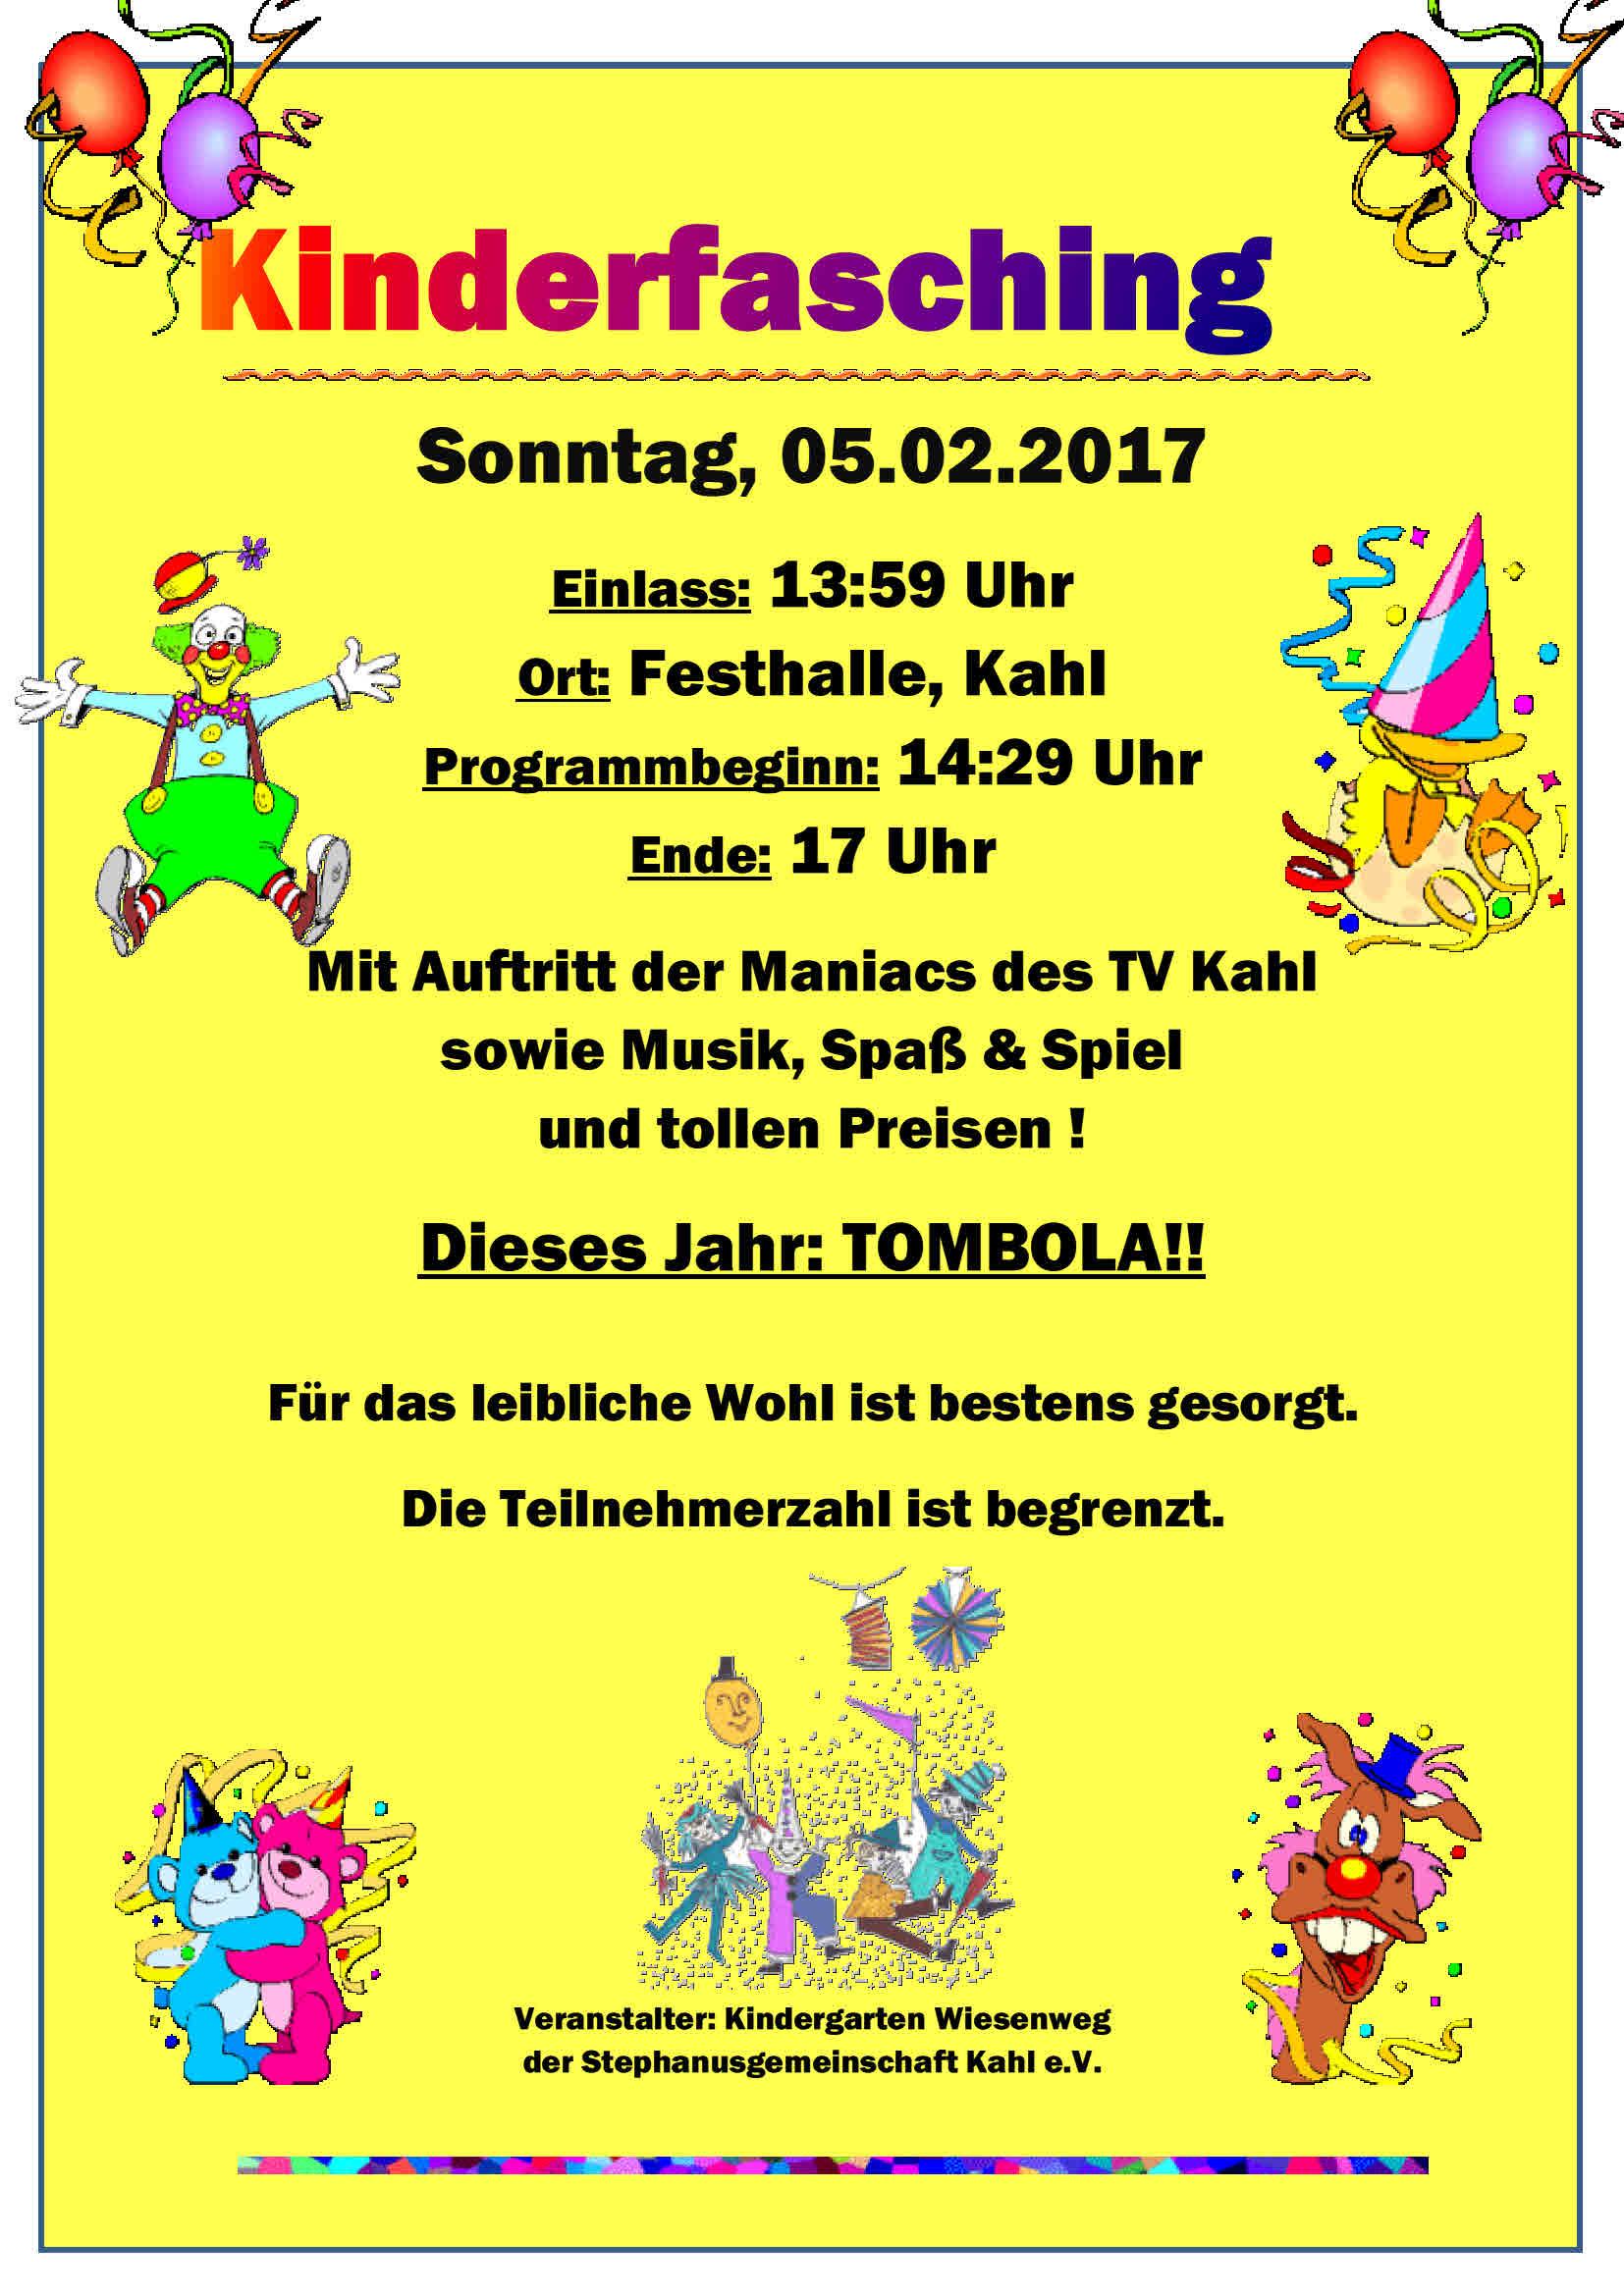 Kinderfasching 2017 plakat